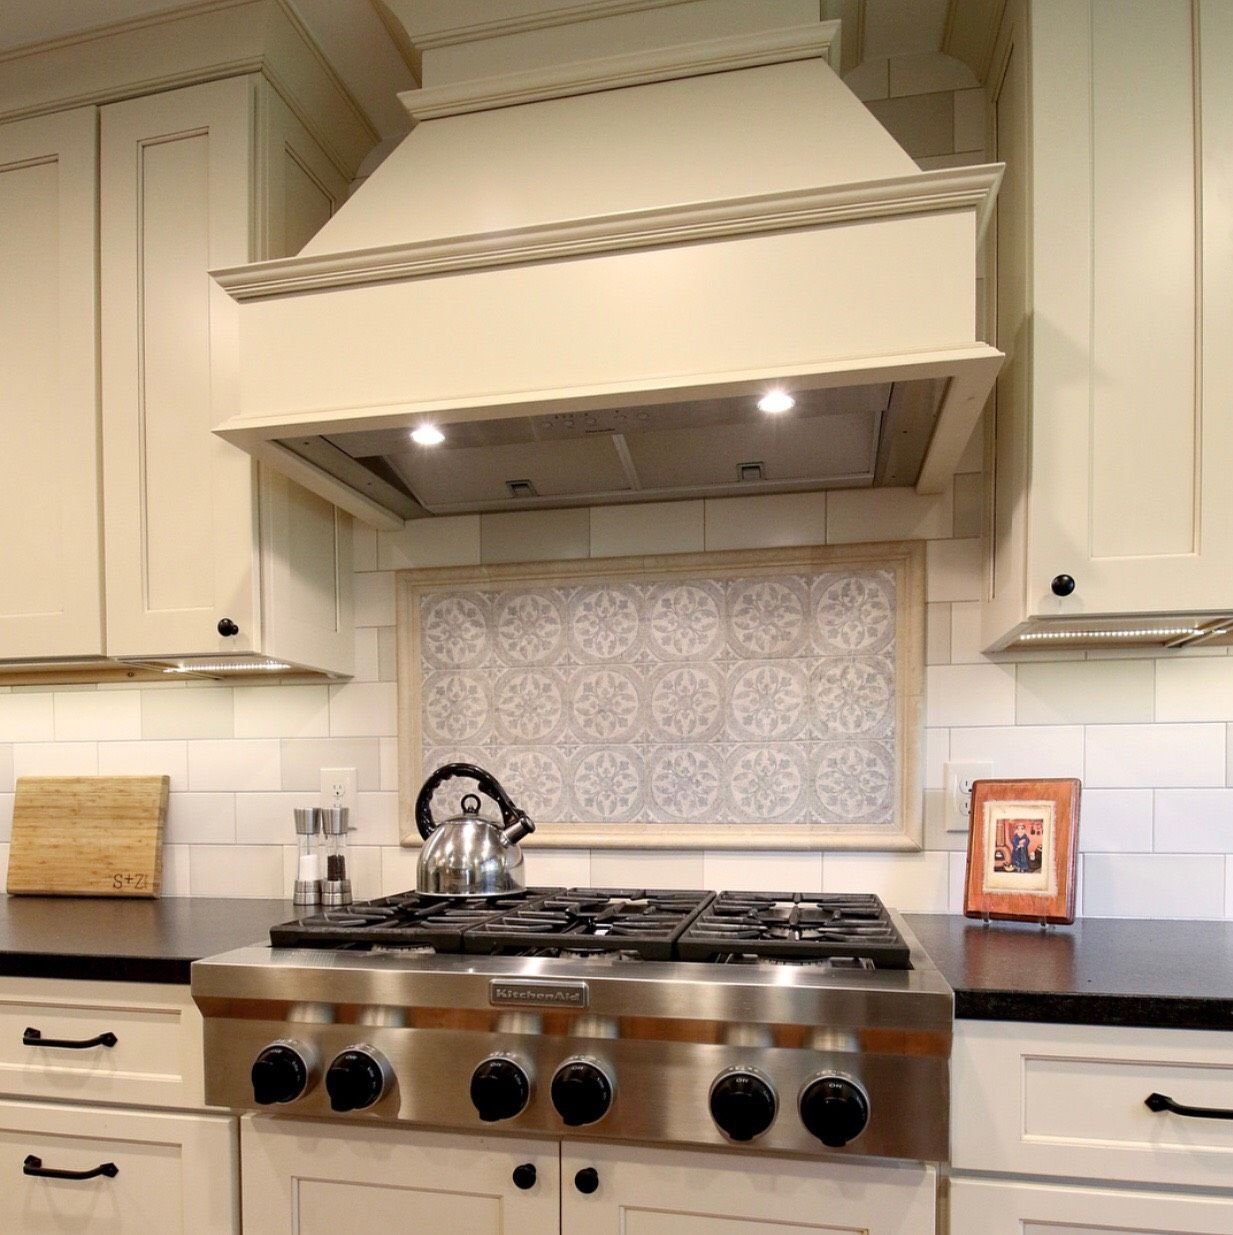 - Clover Collection Artisan Stone Tile, Stone Tiles, Custom Backsplash